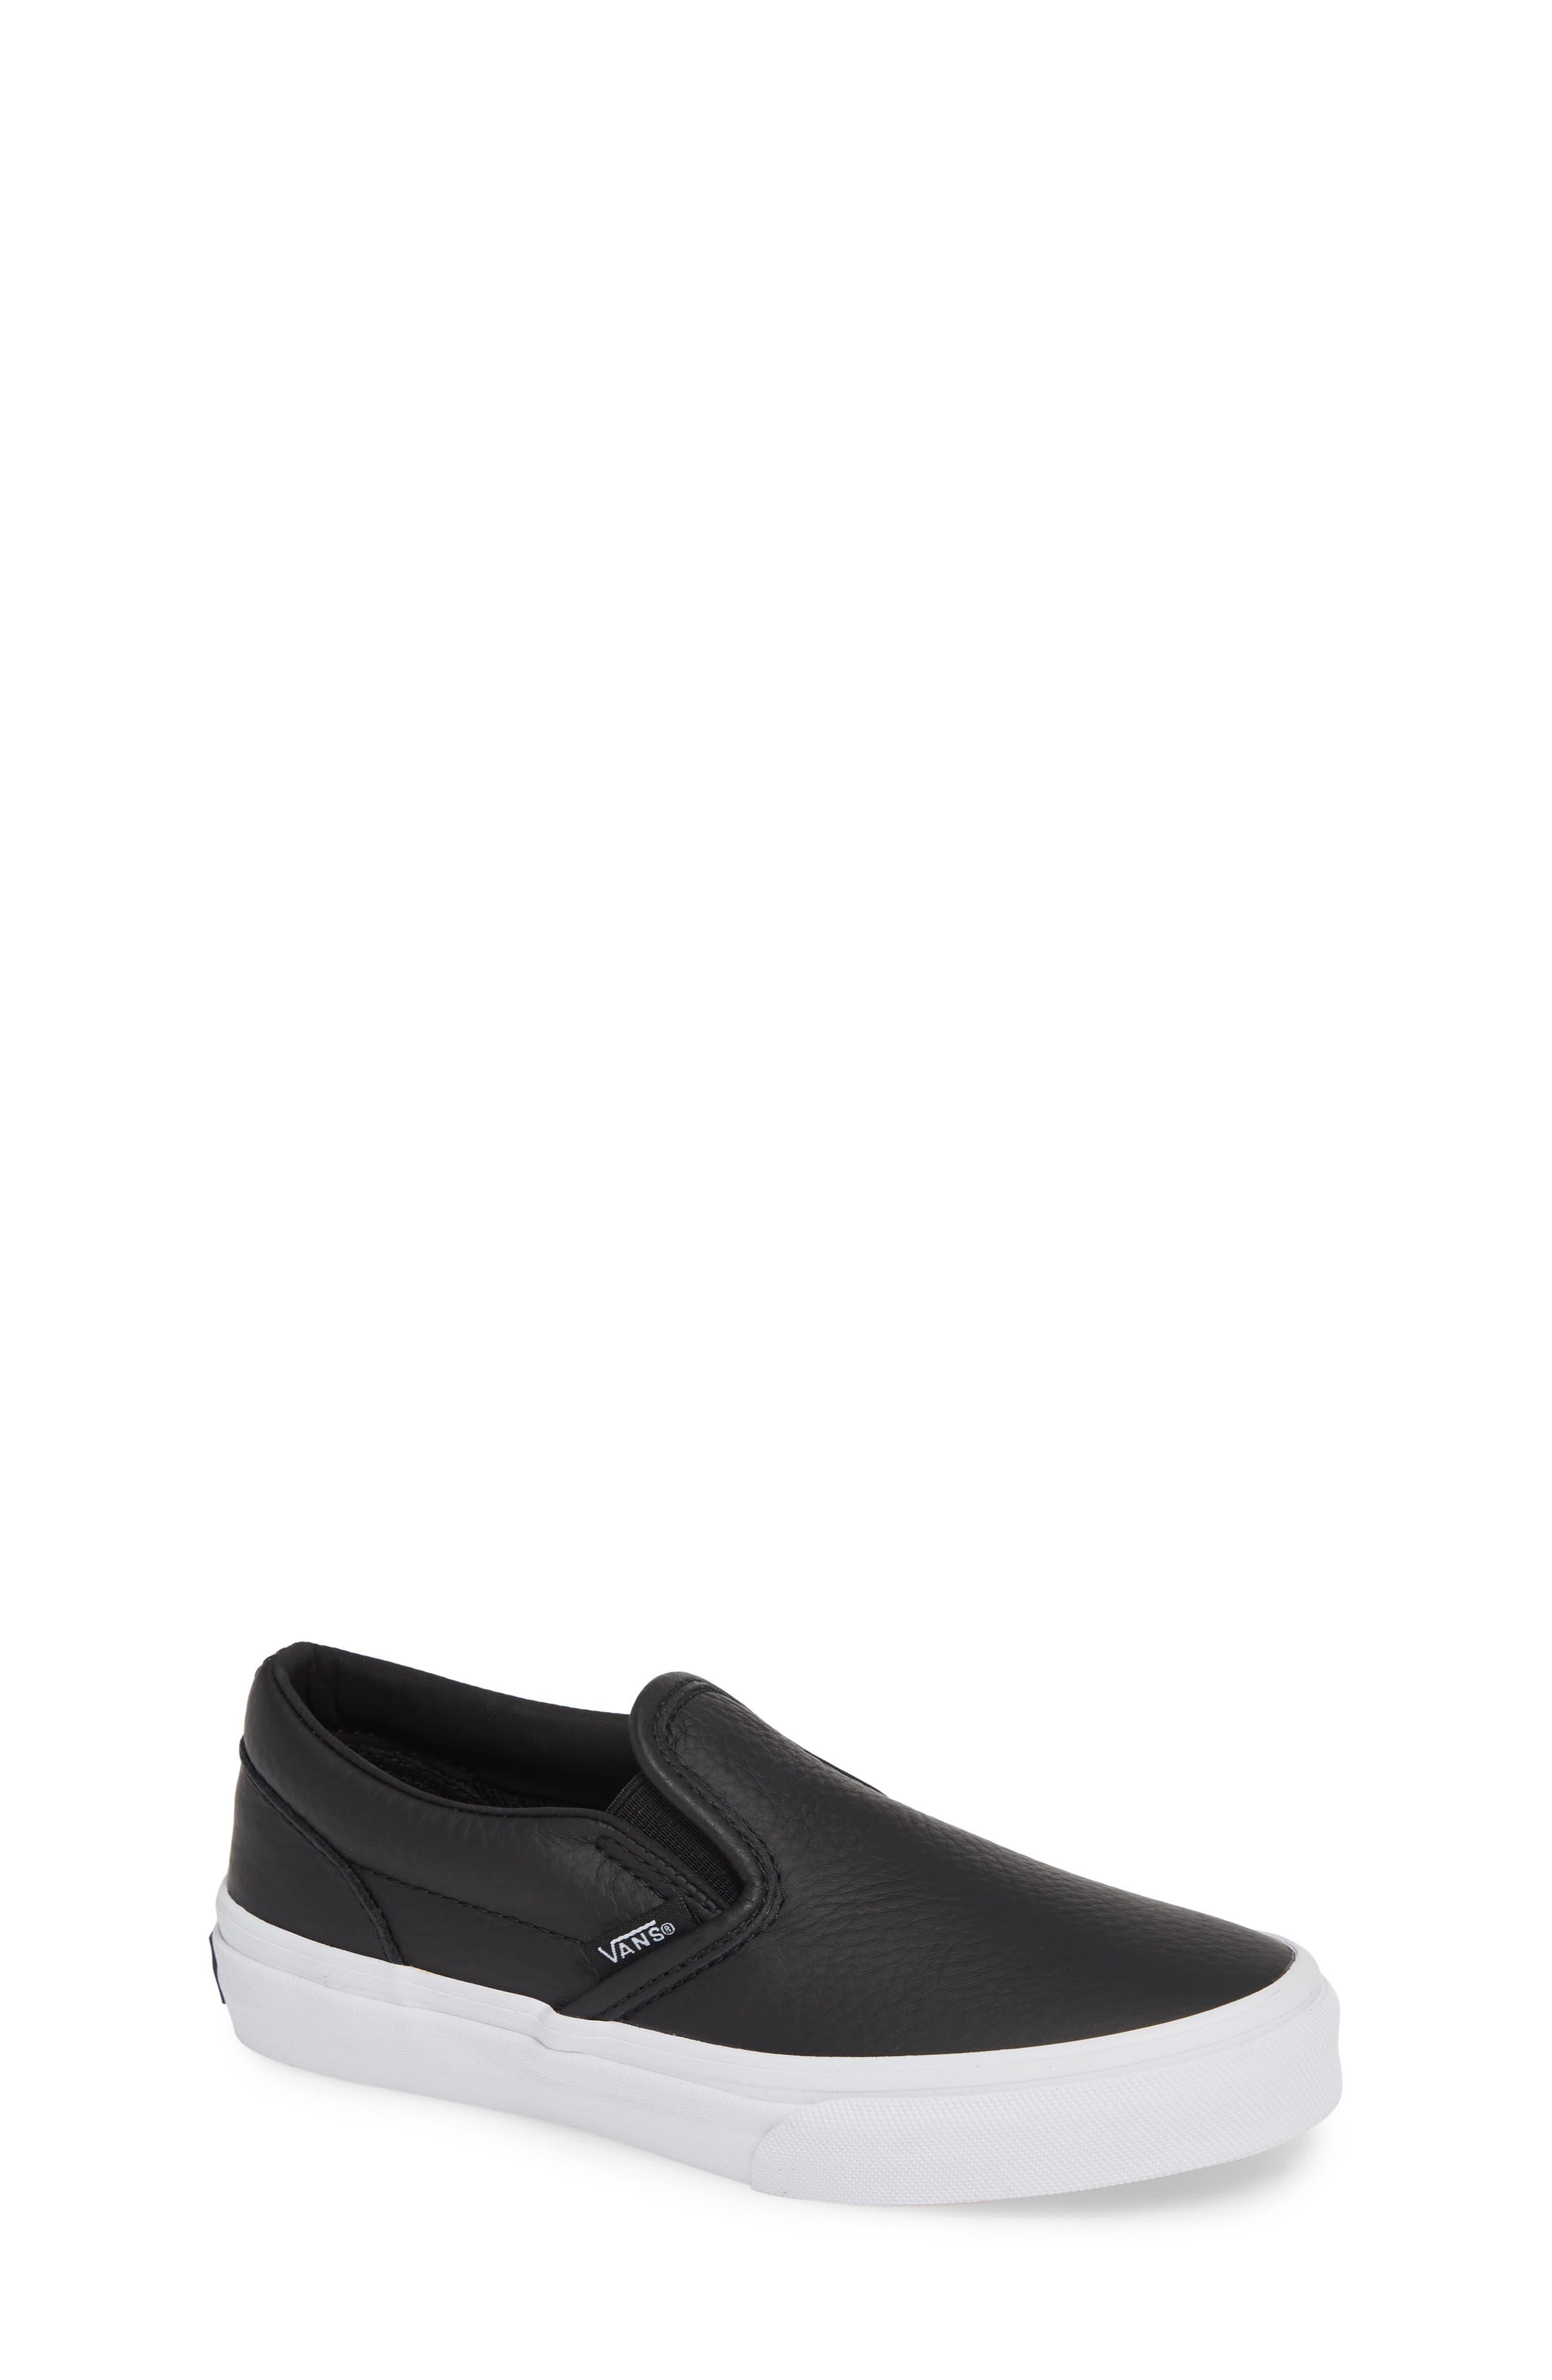 'Classic' Slip-On Sneaker,                         Main,                         color, BLACK/ TRUE WHITE LEATHER